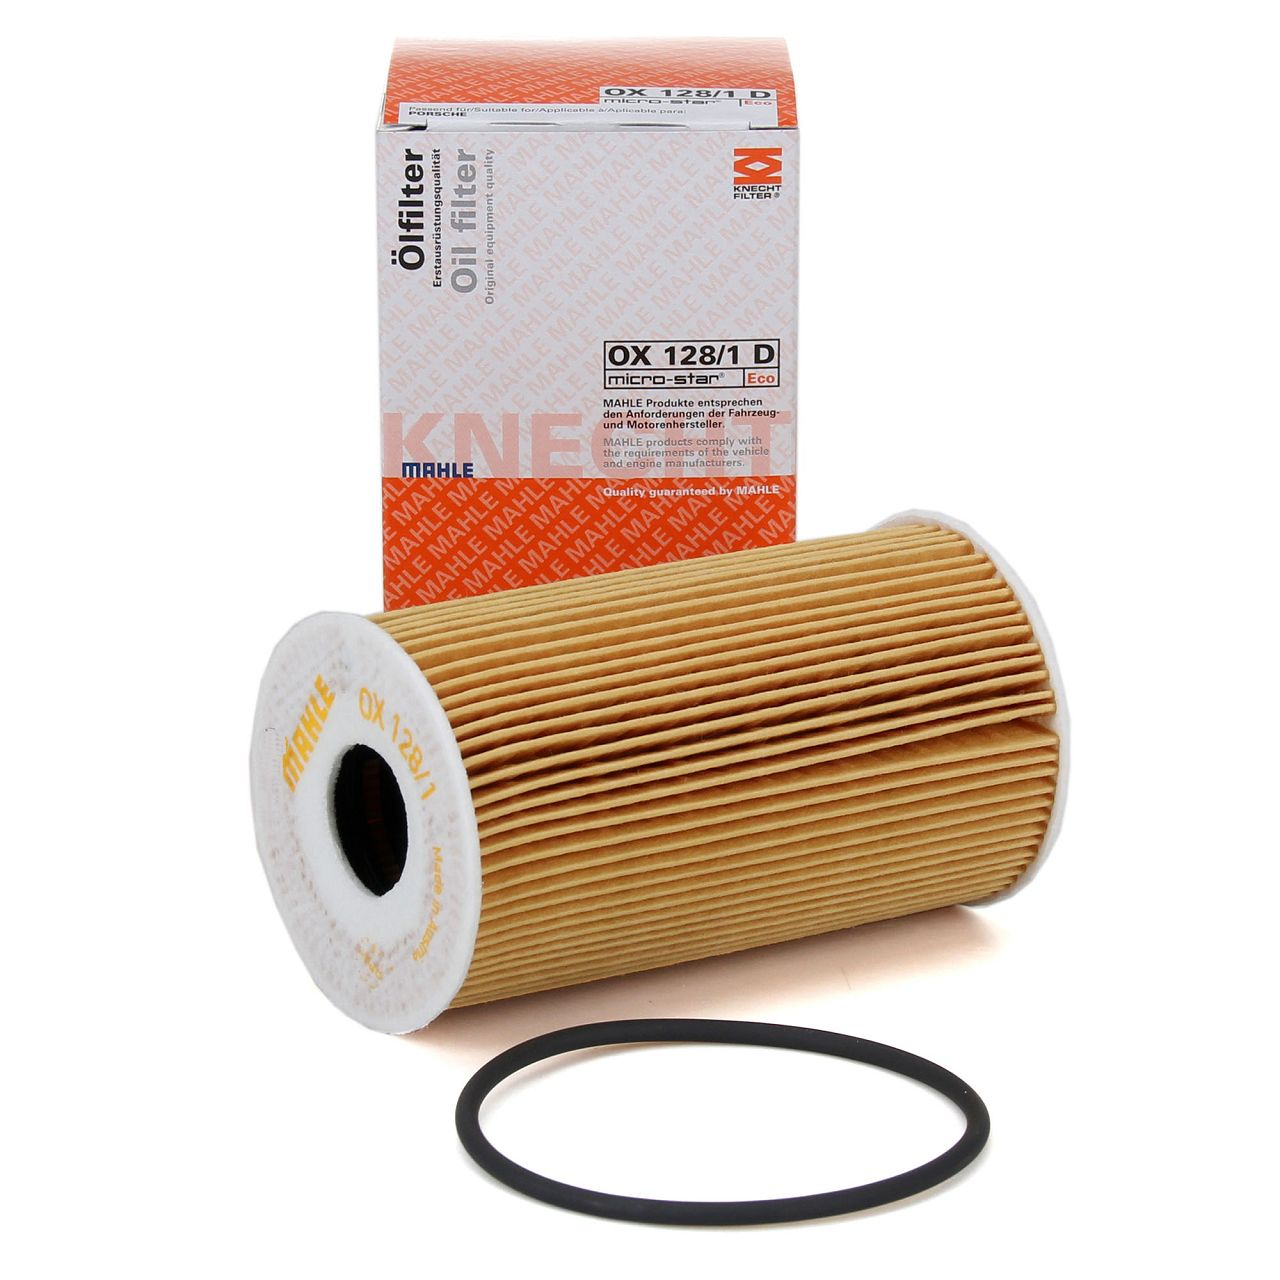 KNECHT / MAHLE OX128/1D Ölfilter für PORSCHE 911 996 997 BOXSTER CAYMAN CAYENNE